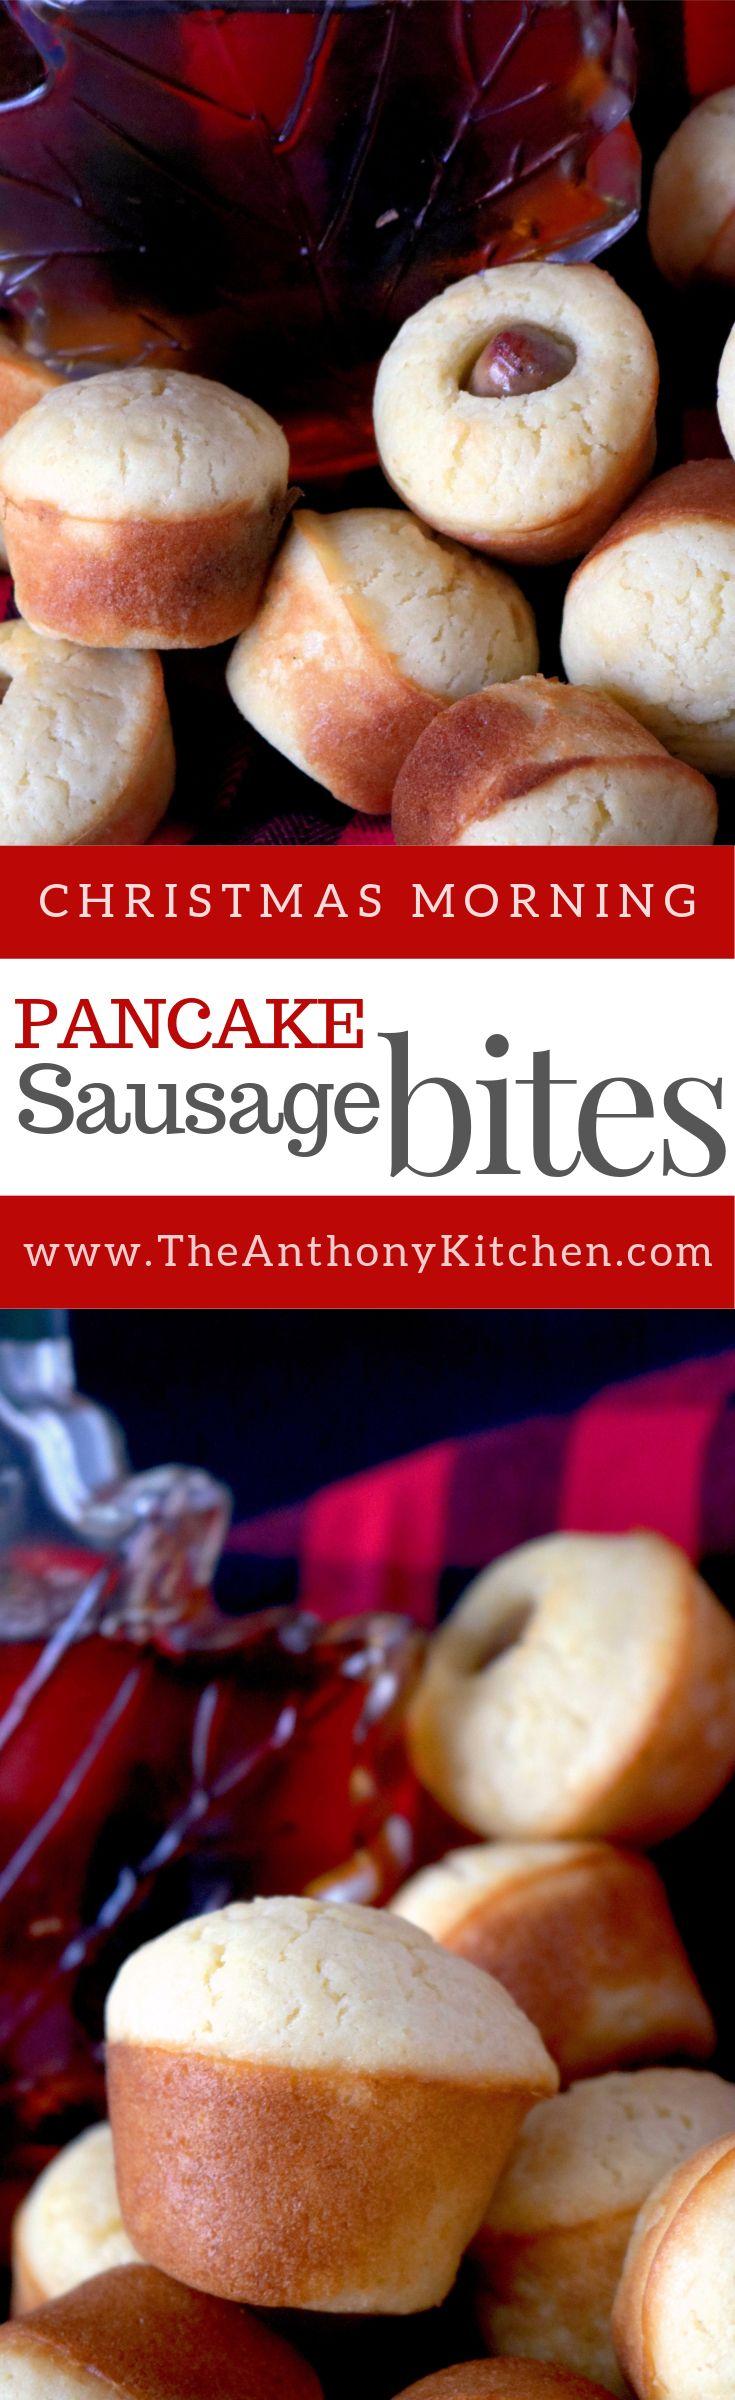 Pancake Sausage Bites | Kid-Friendly Christmas Breakfast Idea | A make-ahead, freezer-friendly breakfast recipe featuring homemade mini muffin pancakes with breakfast sausage links baked inside | #christmasbrunch #recipes #minimuffinpancakes #christmasmorningrecipe